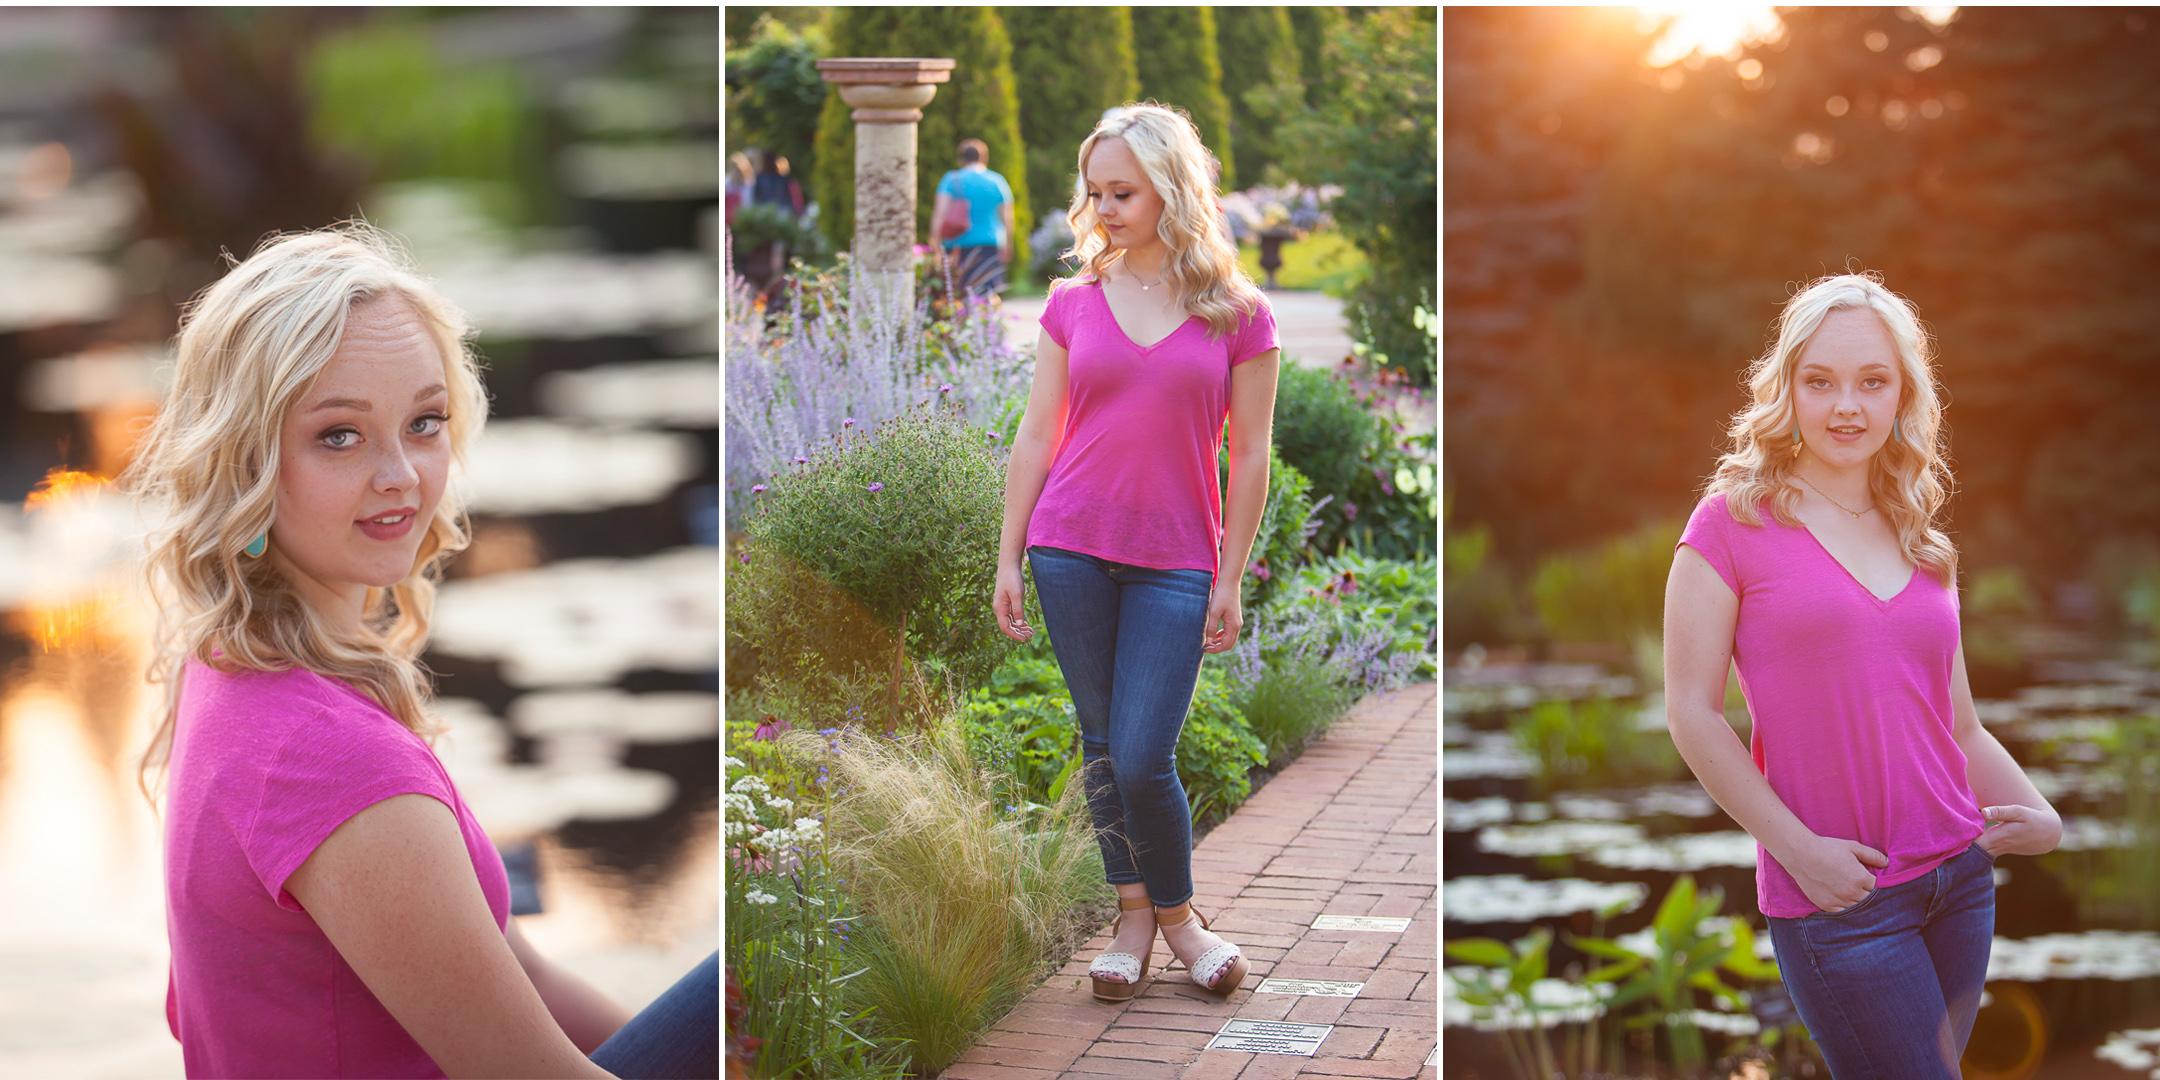 High school senior pictures outside by flowers and water at the Denver Botanic Gardens with photographer Jennifer Koskinen, Merritt Portrait Studio